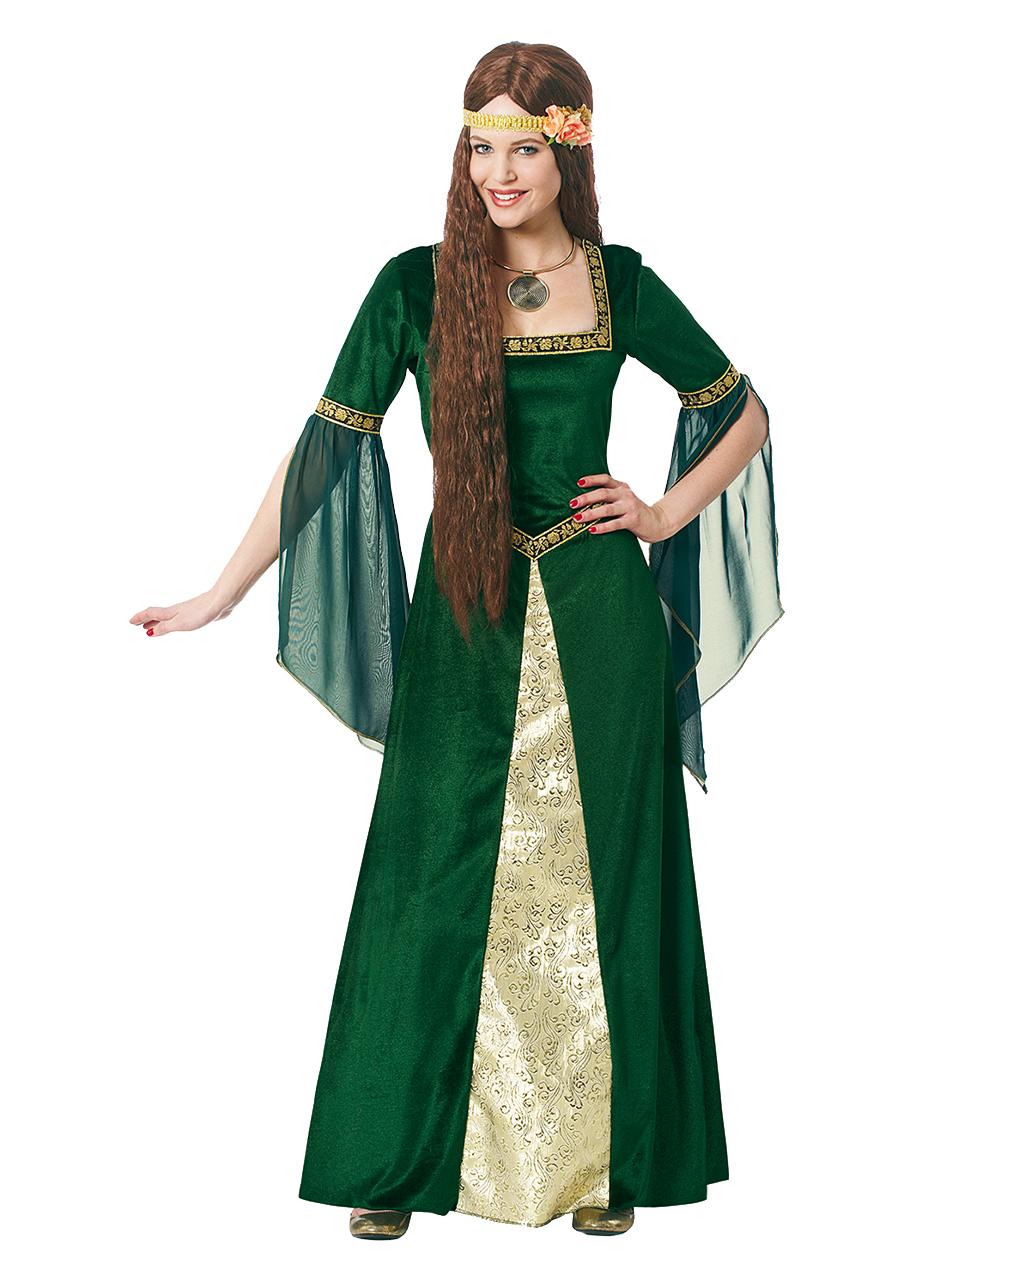 Noble Castle Woman Costume   Medieval Dress At Low Prices   Horror Shop.com